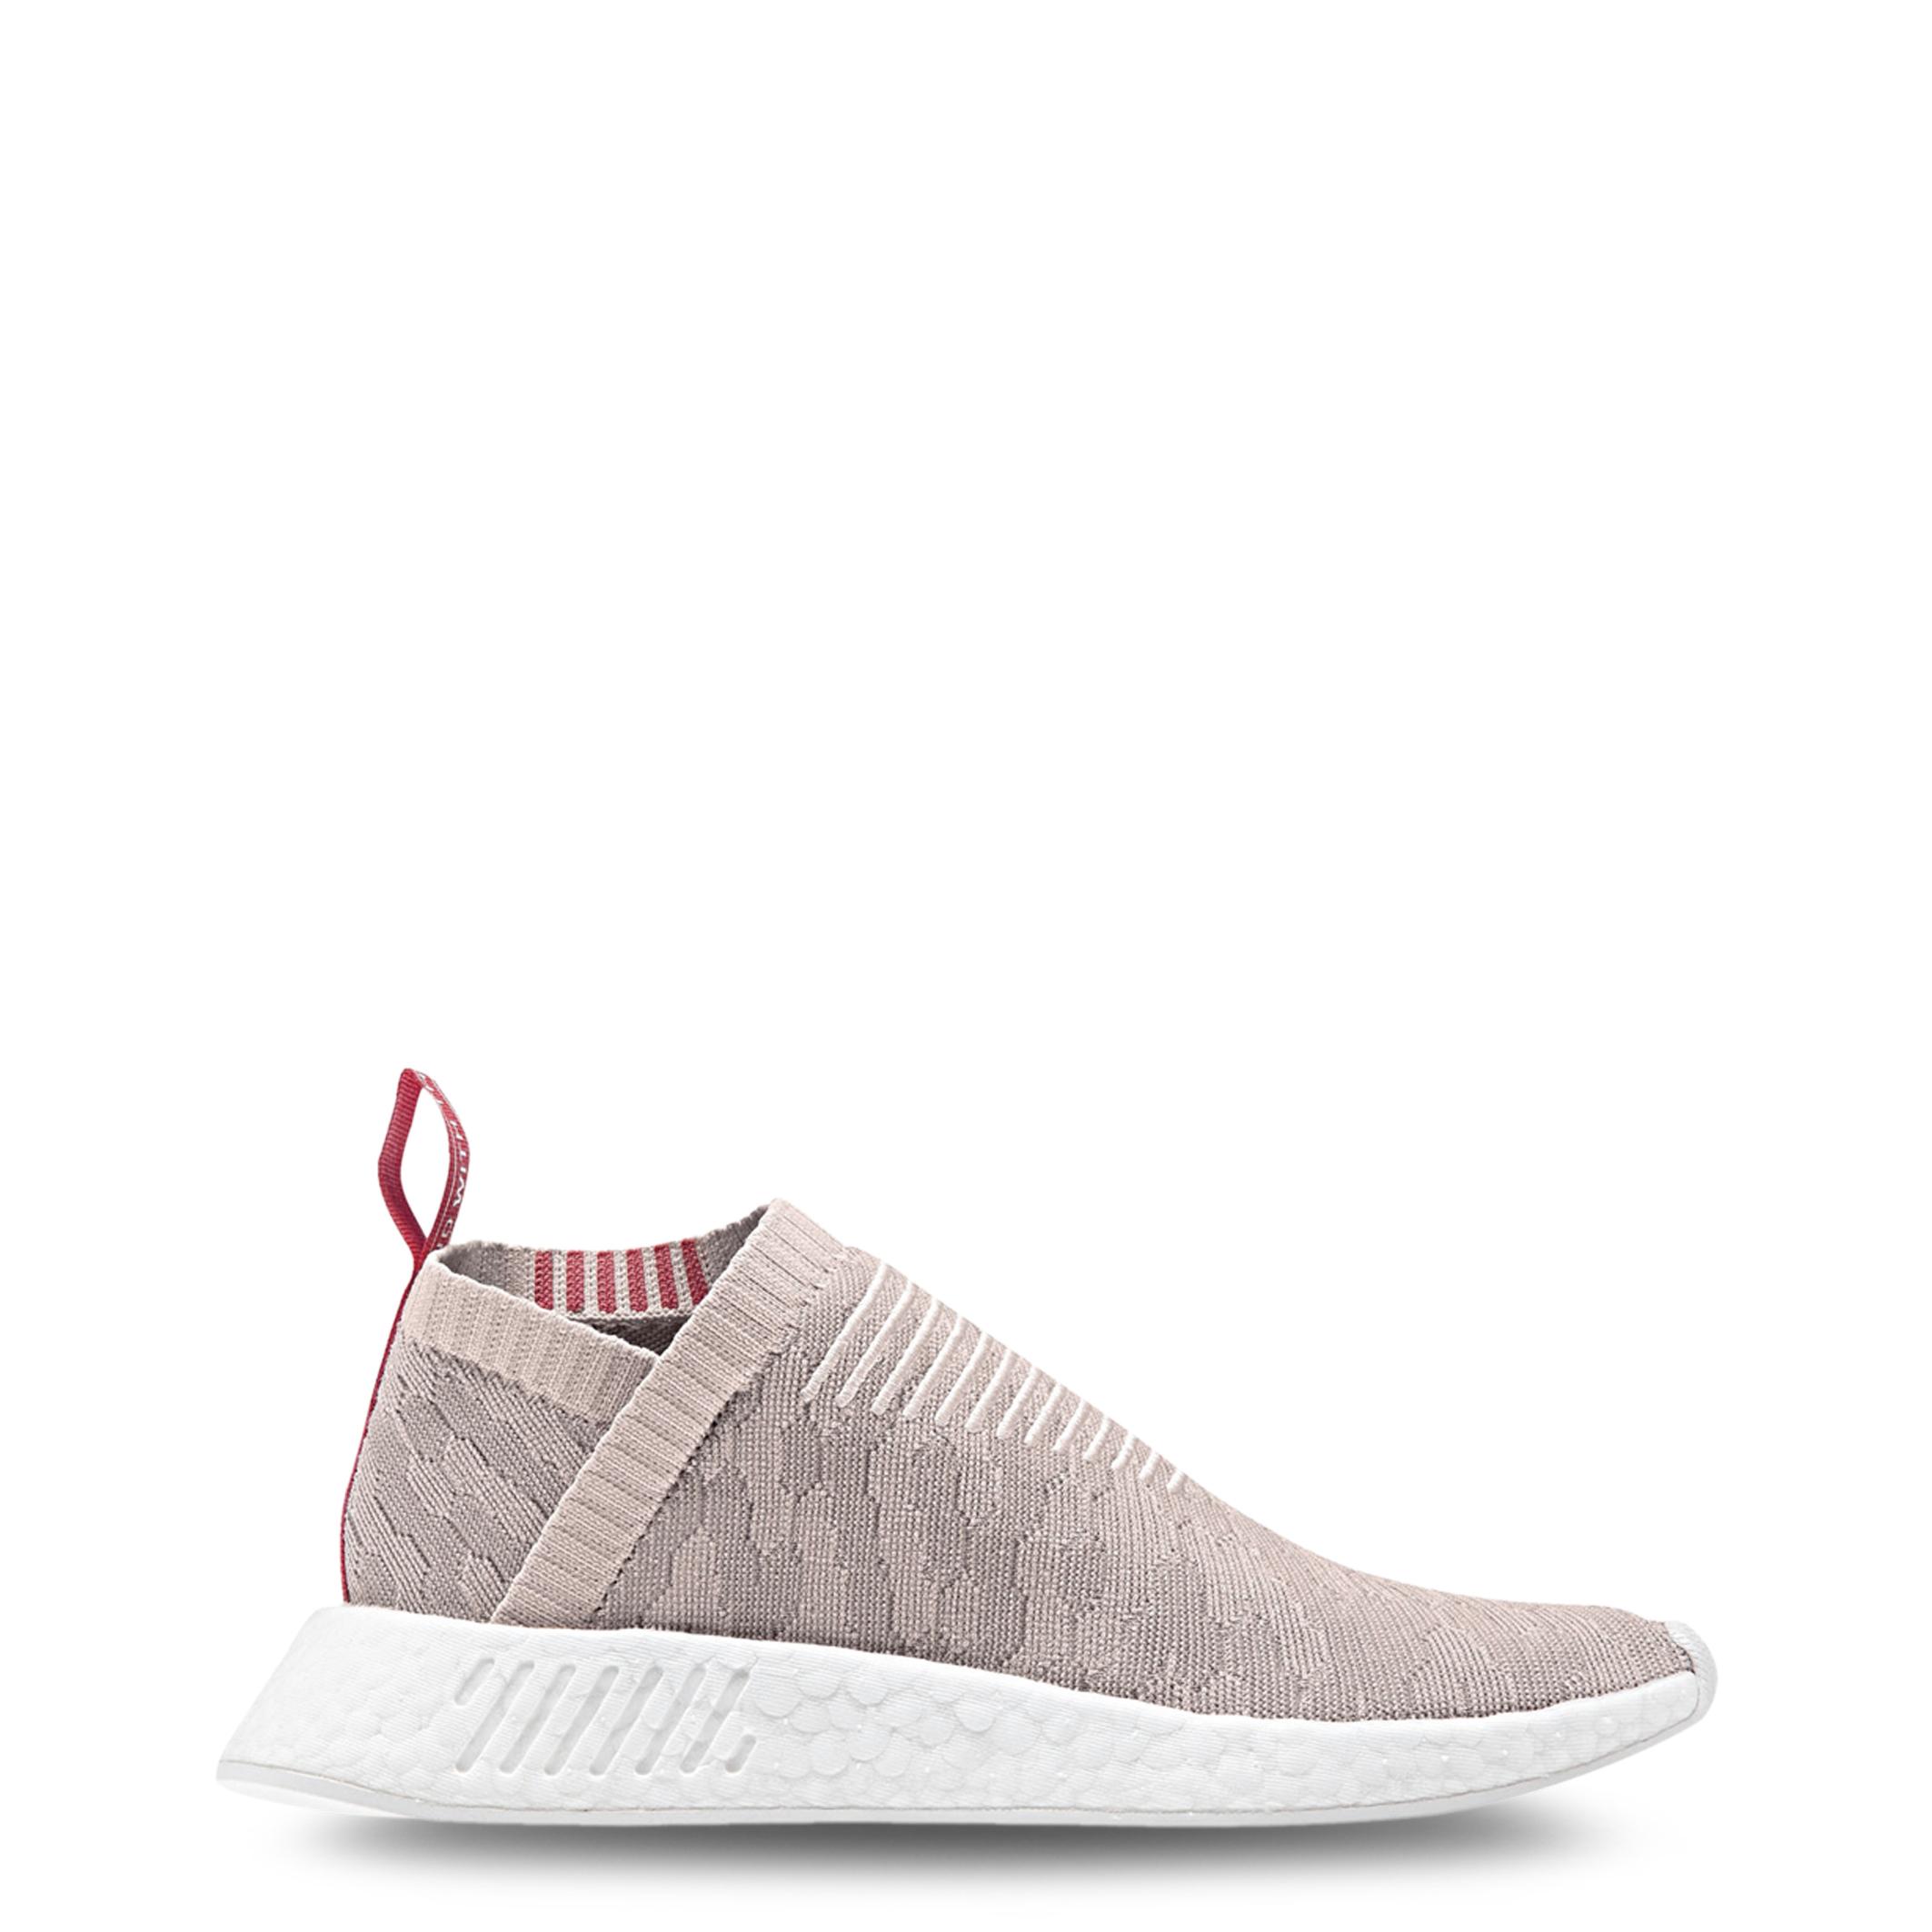 Adidas NMD-CS2-W grey